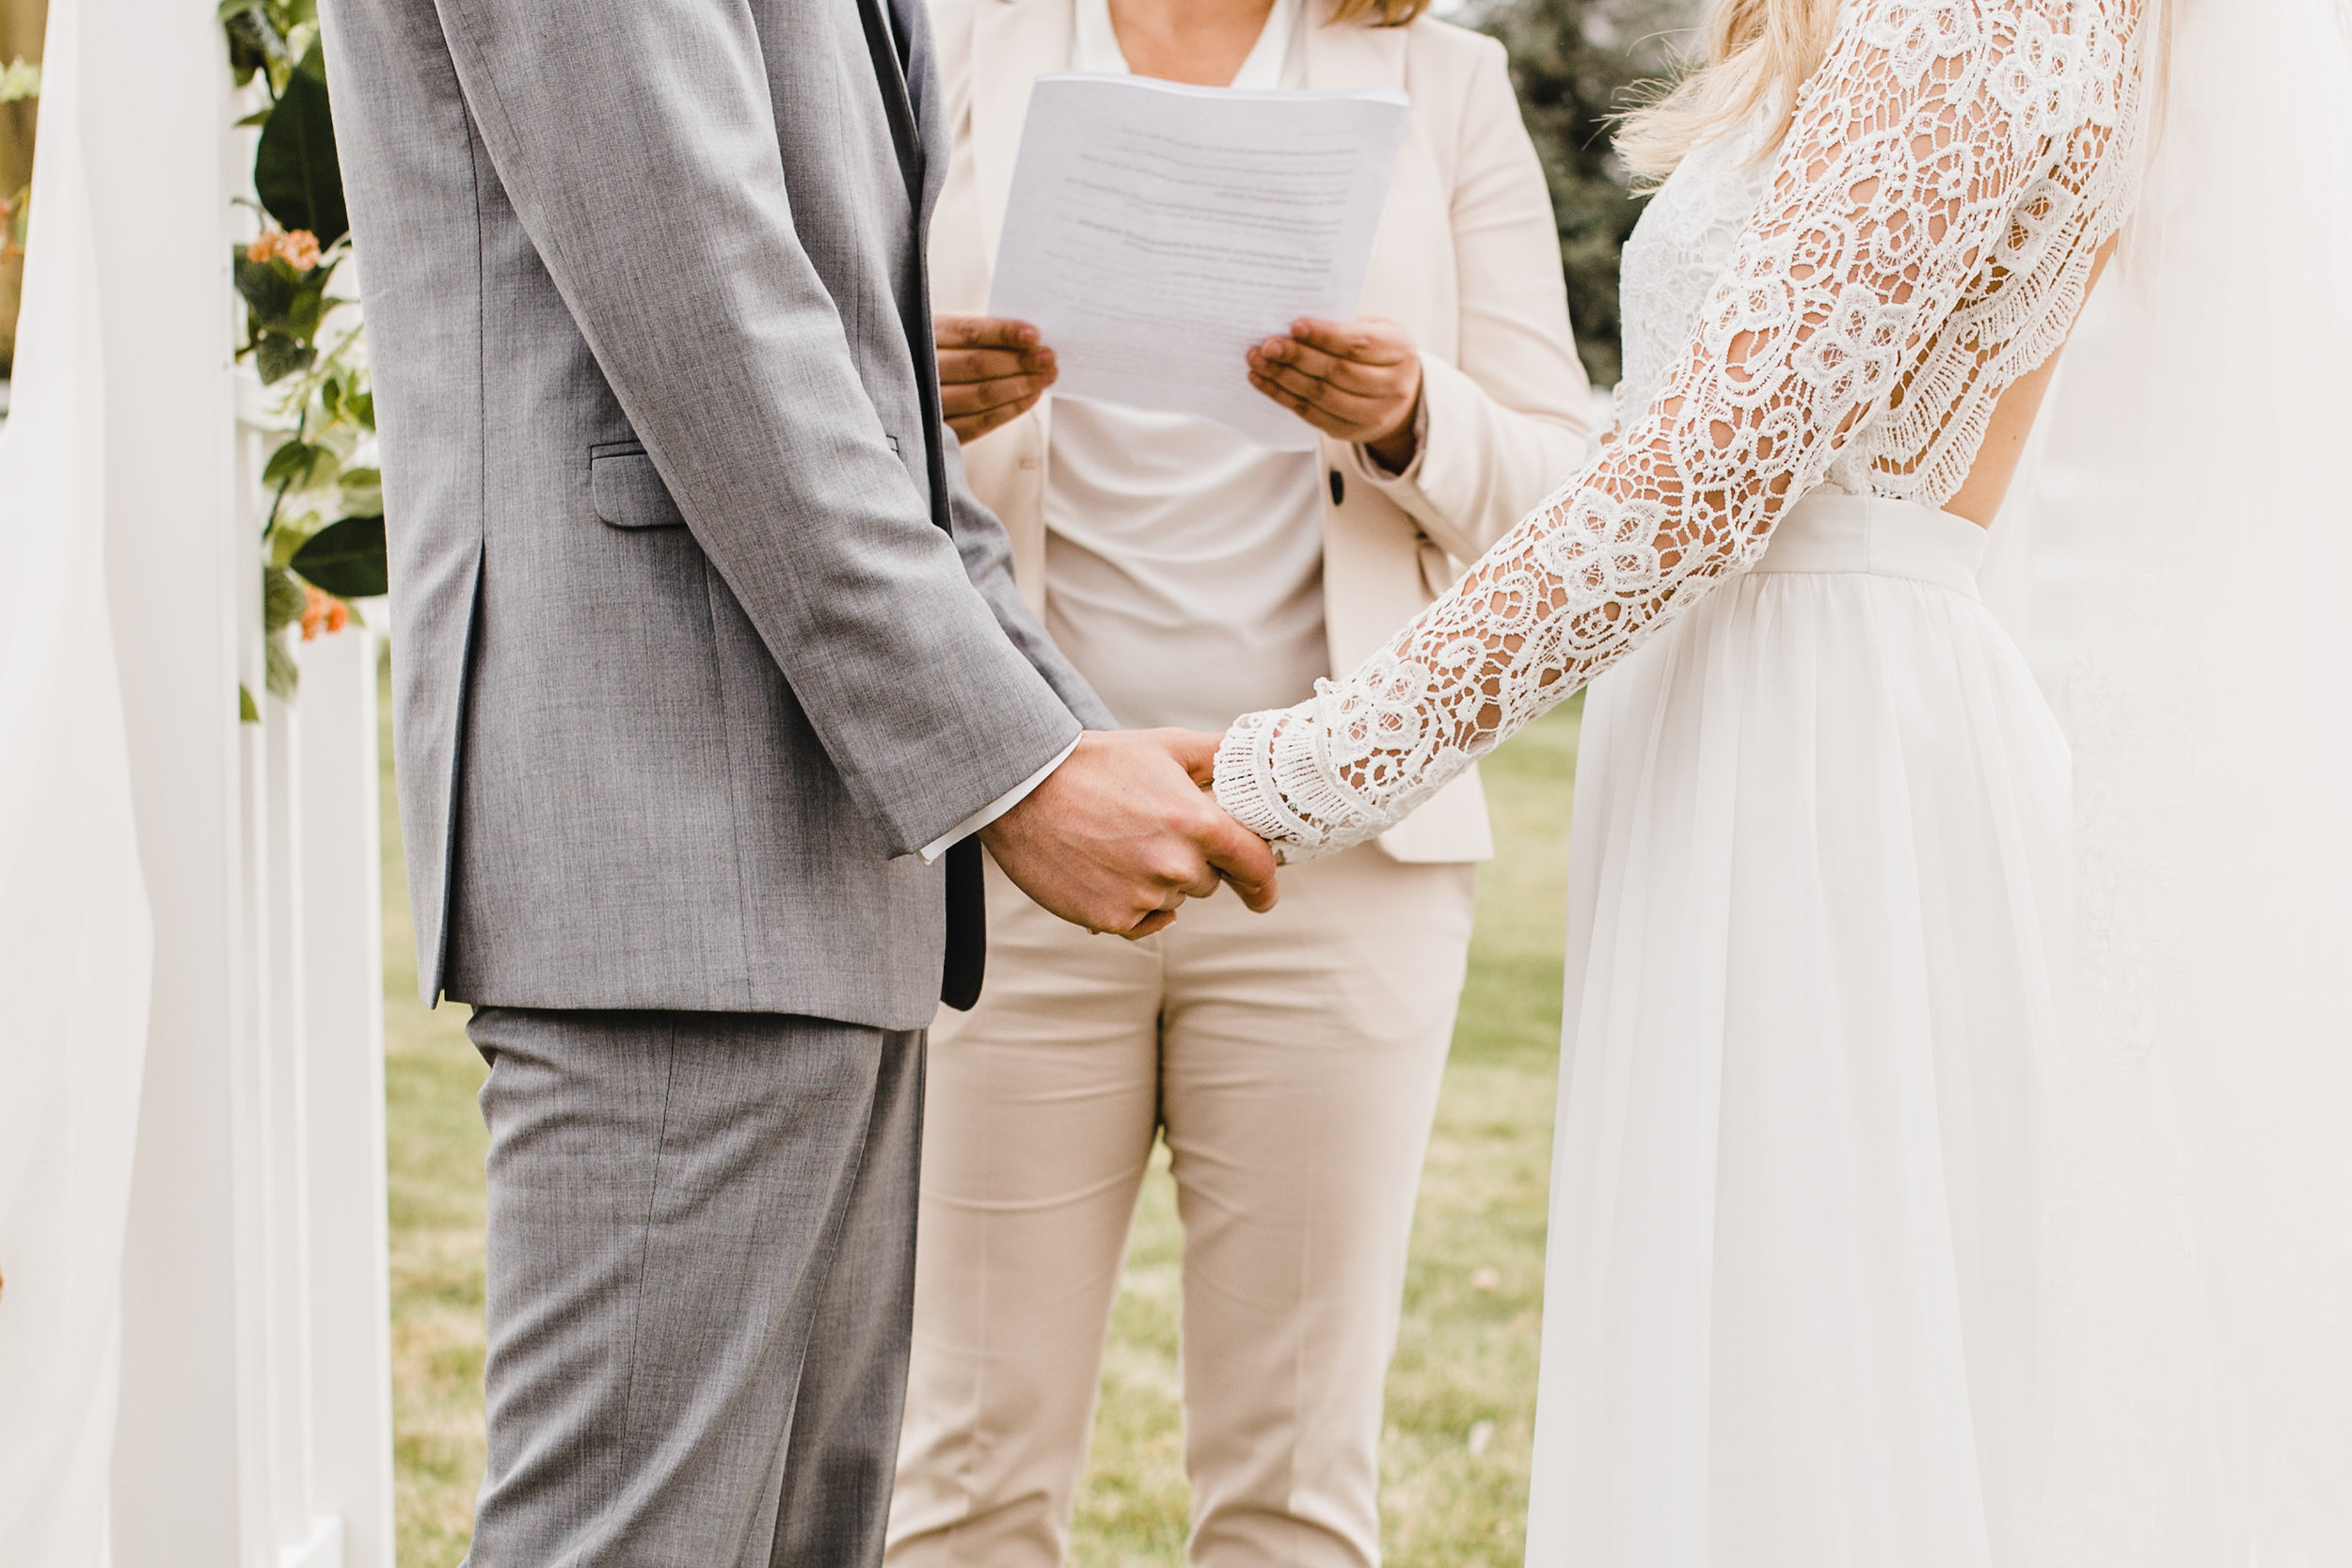 san diego wedding photographer ceremony outdoor holding hands